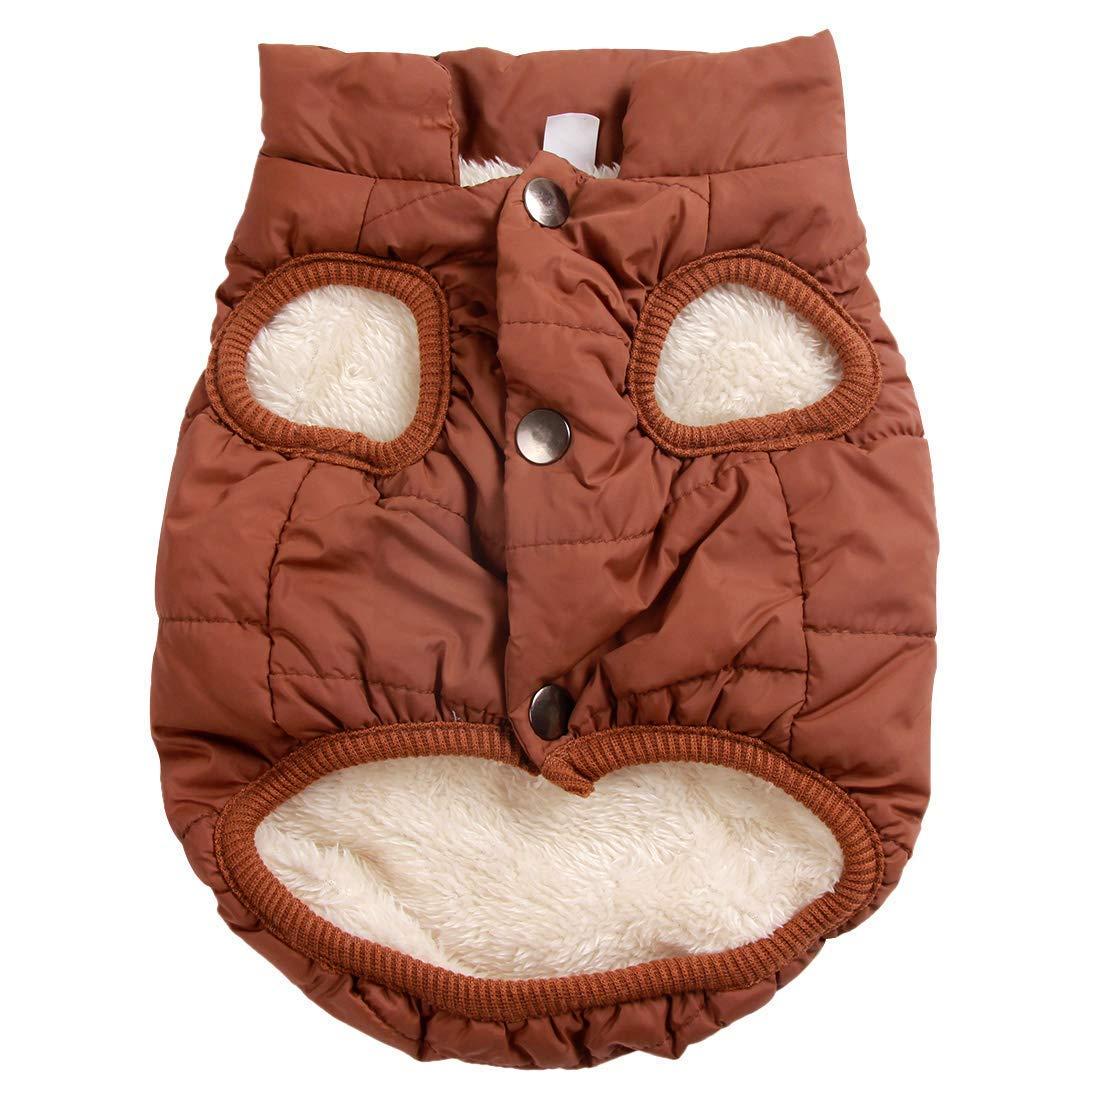 BROWN XXXL BROWN XXXL LLYU Pet Wool Lining Super Warm Dog Jacket Winter Cold Weather, Super Soft Puppy Vest Windproof Puppy Coat (color   Brown, Size   XXXL)